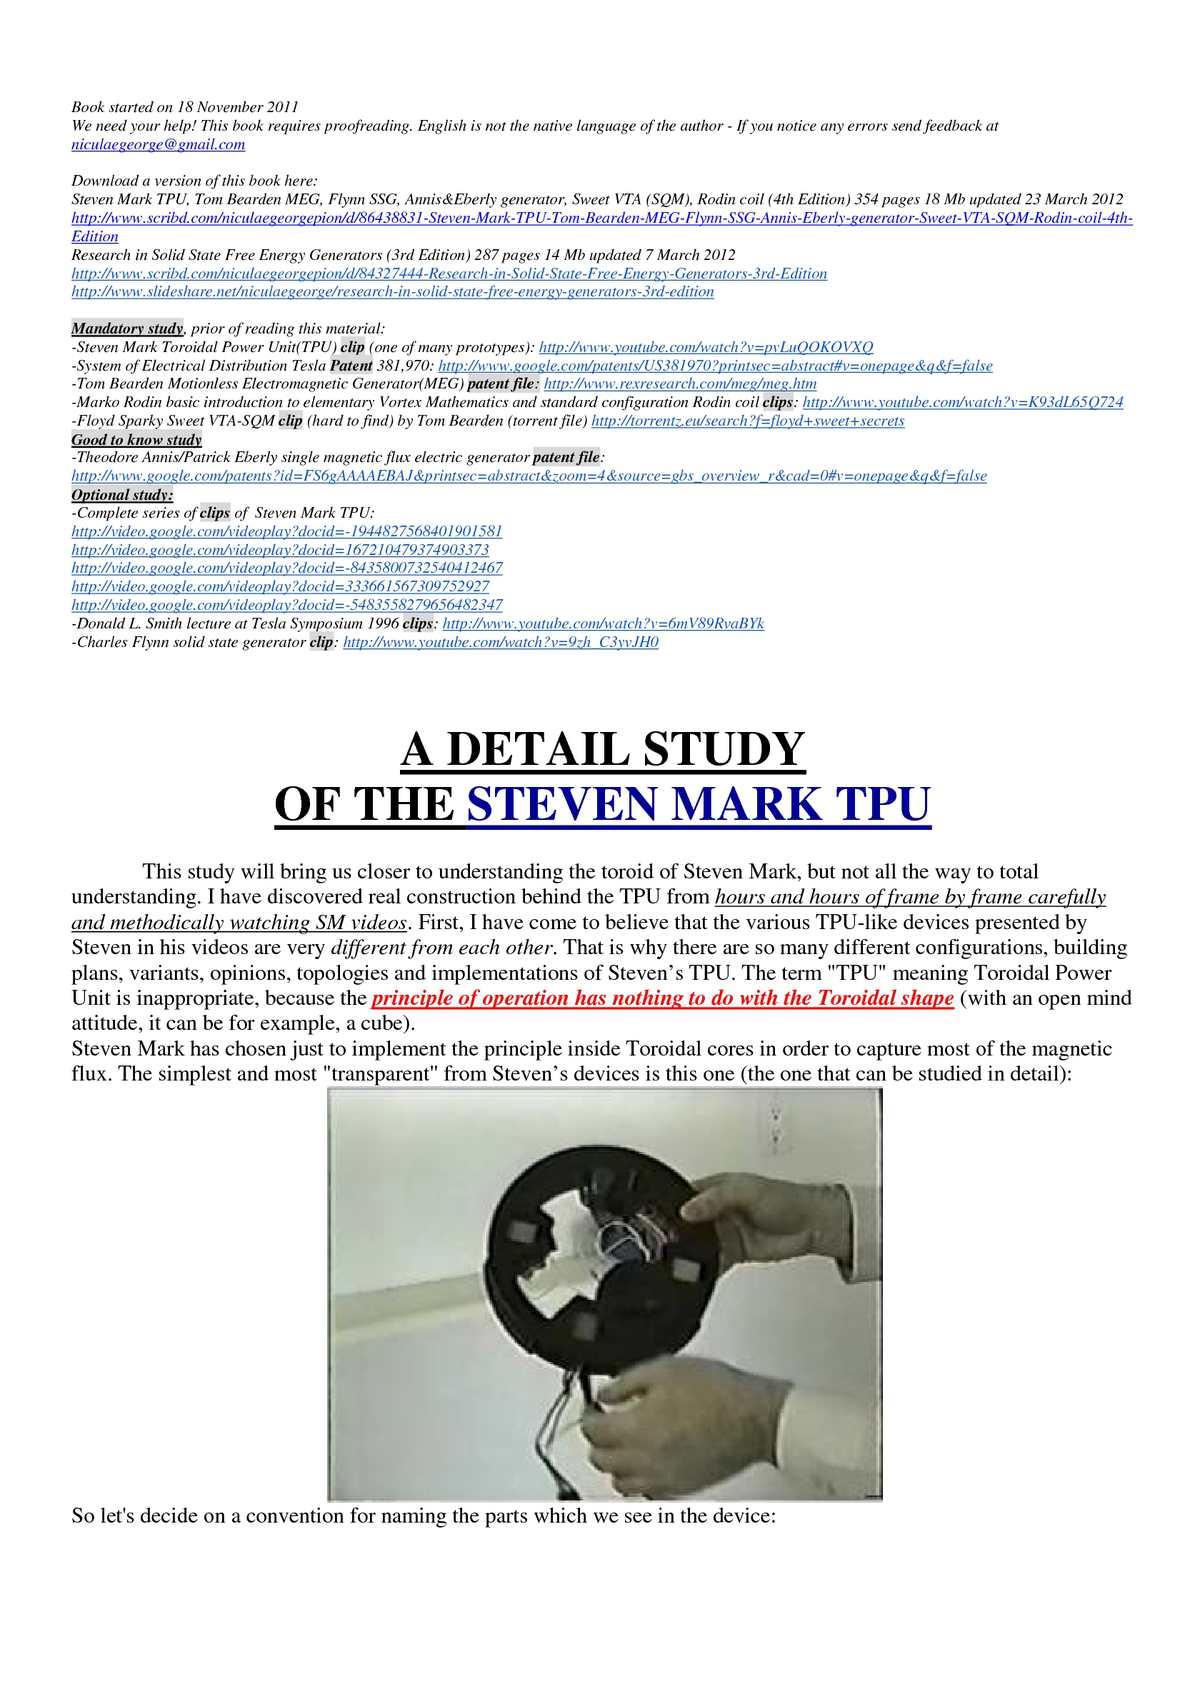 Calaméo - Steven Mark TPU, Tom Bearden MEG, Flynn SSG, Annis&Eberly  generator, Sweet VTA (SQM), Rodin coil (4th Edition)